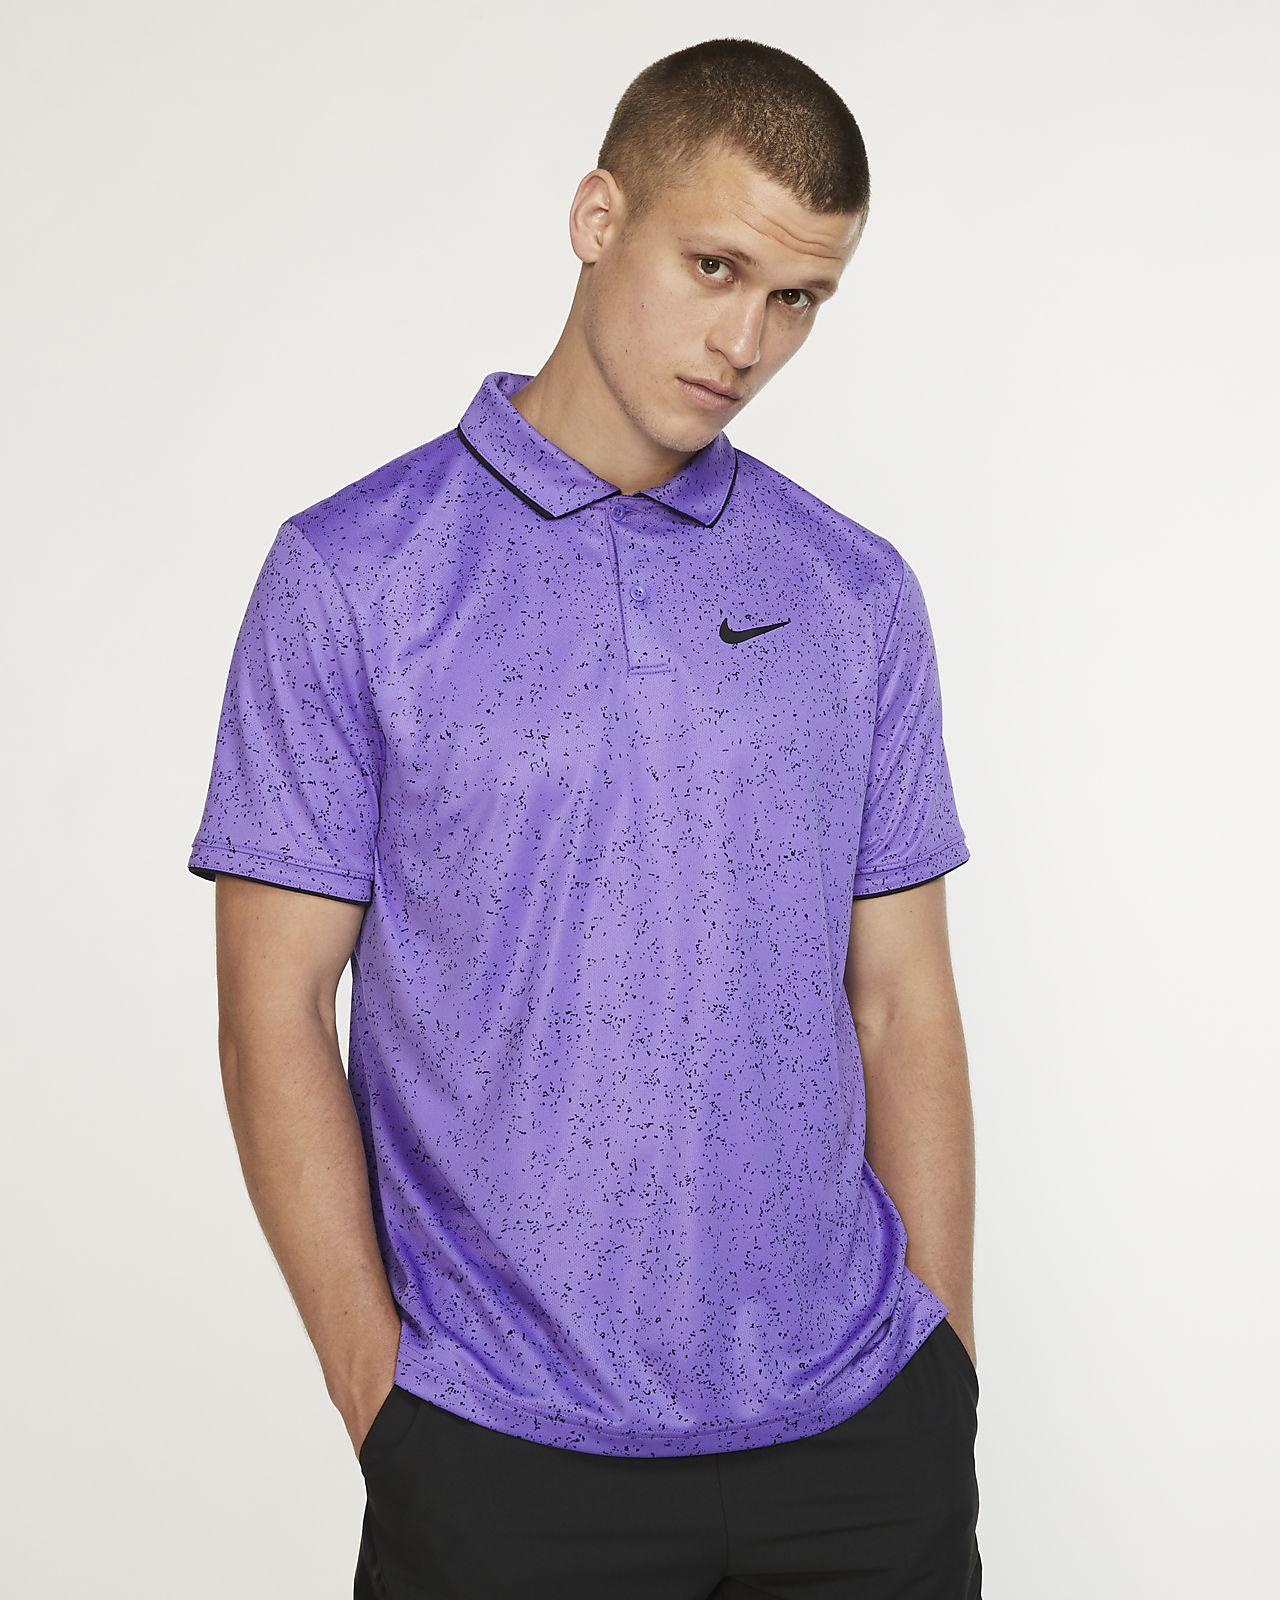 NikeCourt Dri-FIT Herren-Tennis-Poloshirt mit Print